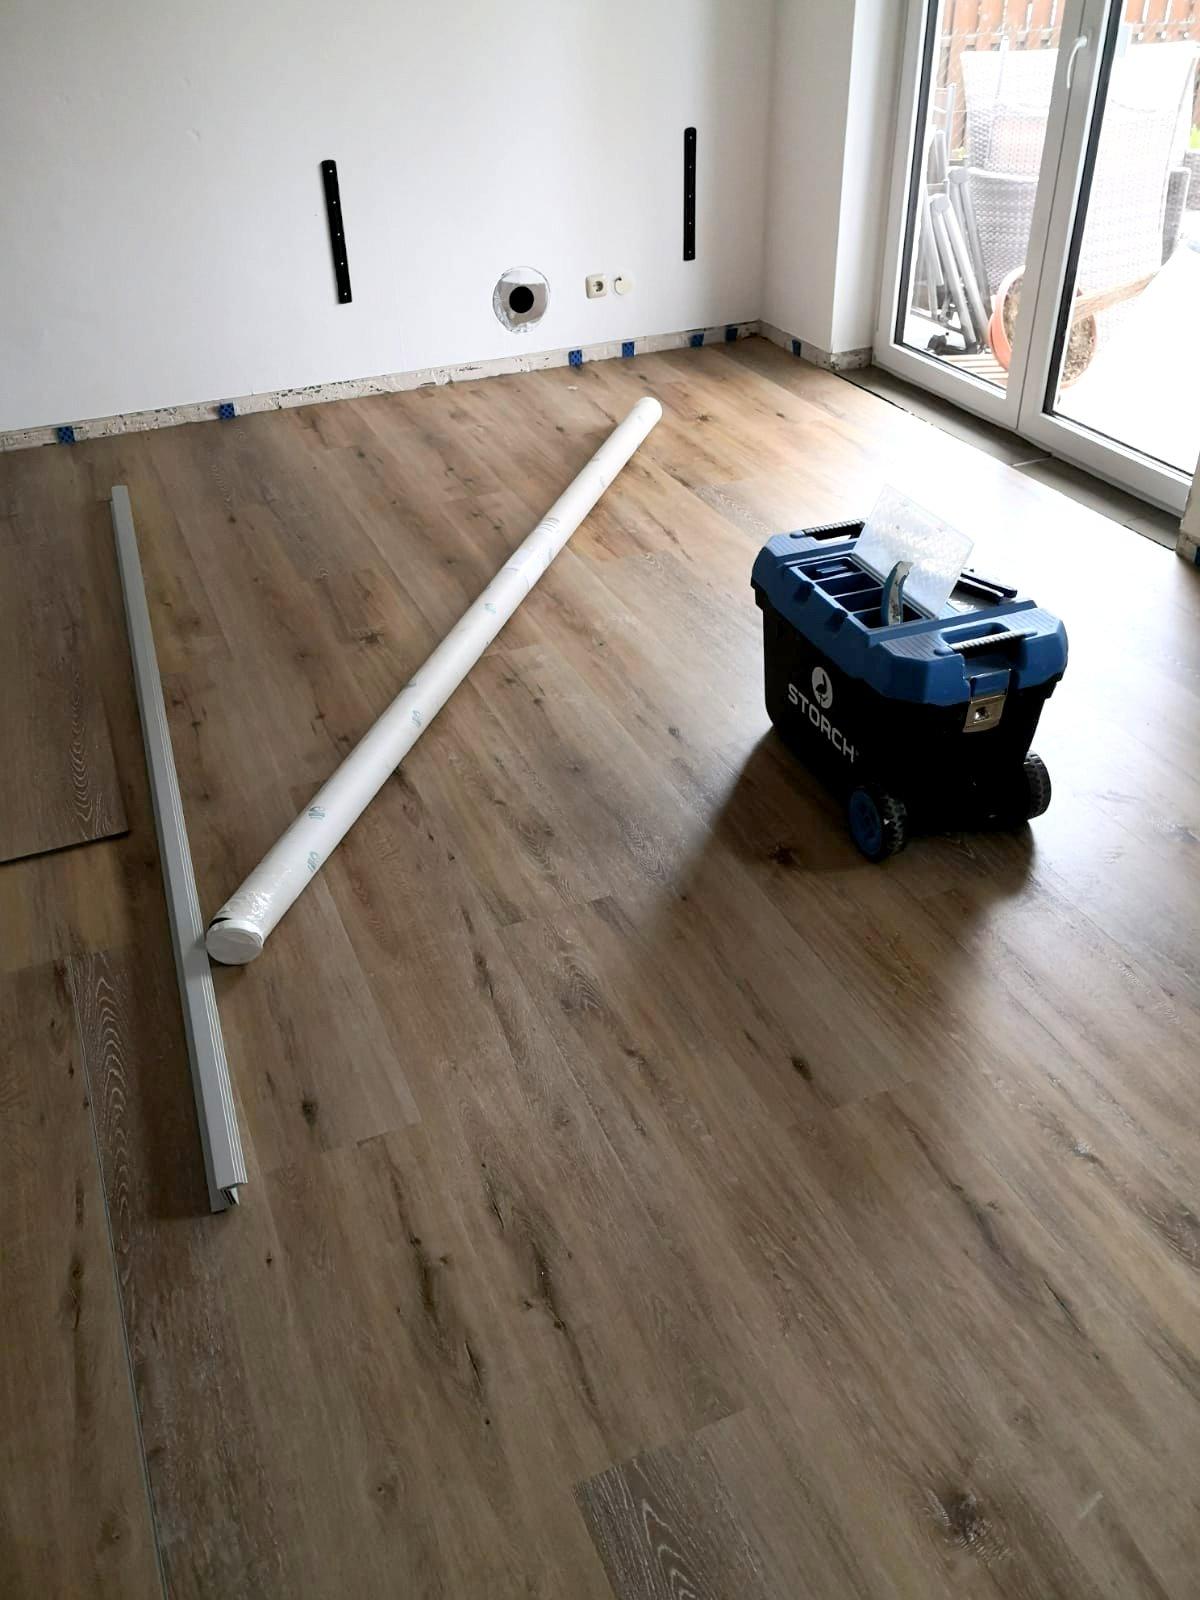 Mandic Baudekoration Treppe Bodenbelag (13)